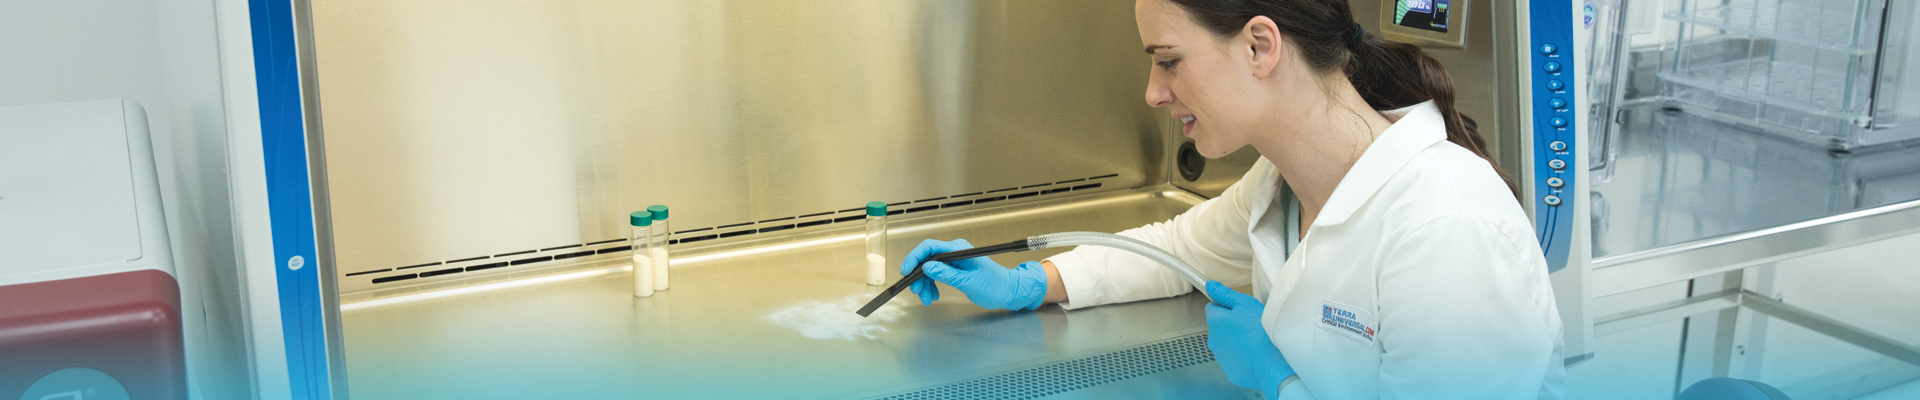 Ultrasonic & Vacuum Cleaners, UV Sterilizers